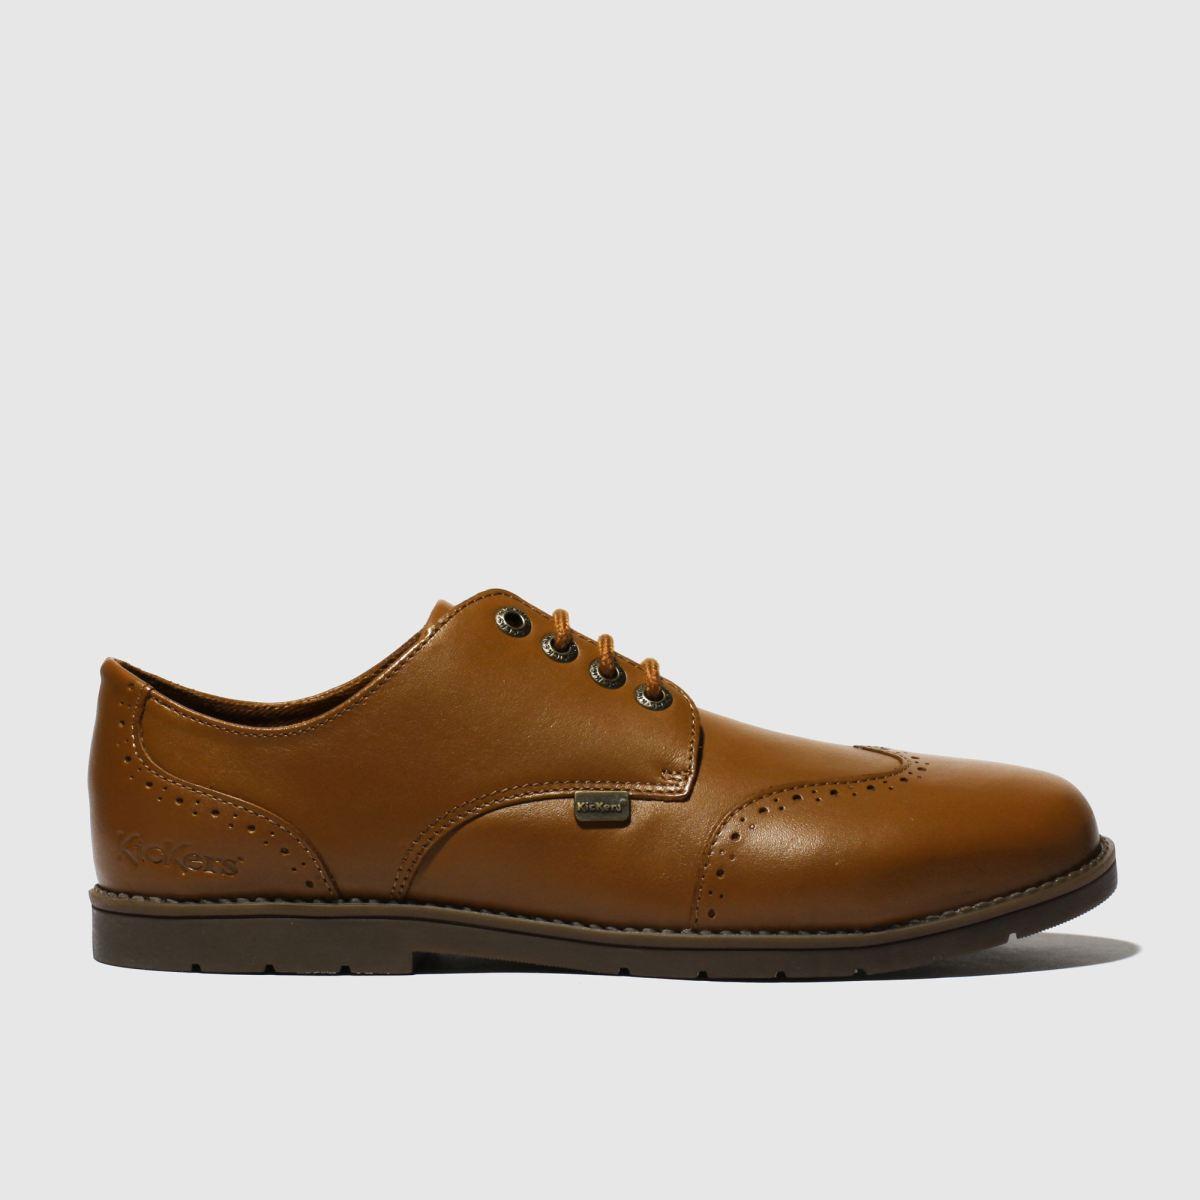 Kickers Tan Orin Brogue Lo Shoes Youth